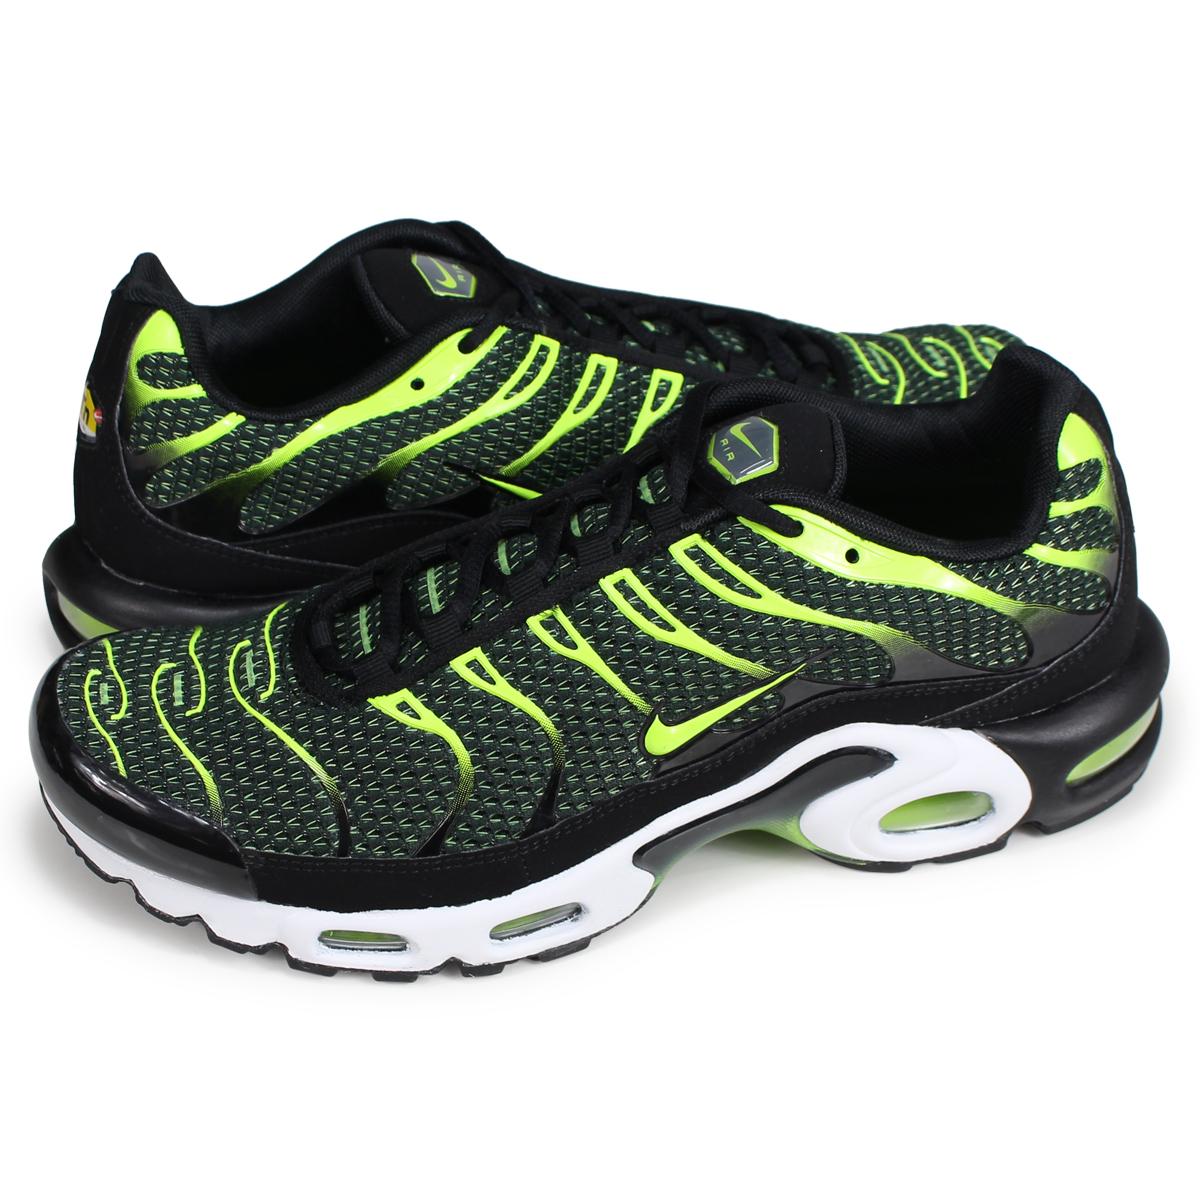 842474e0d2e0e Whats up Sports  NIKE AIR MAX PLUS Kie Ney AMAX plus sneakers men ...